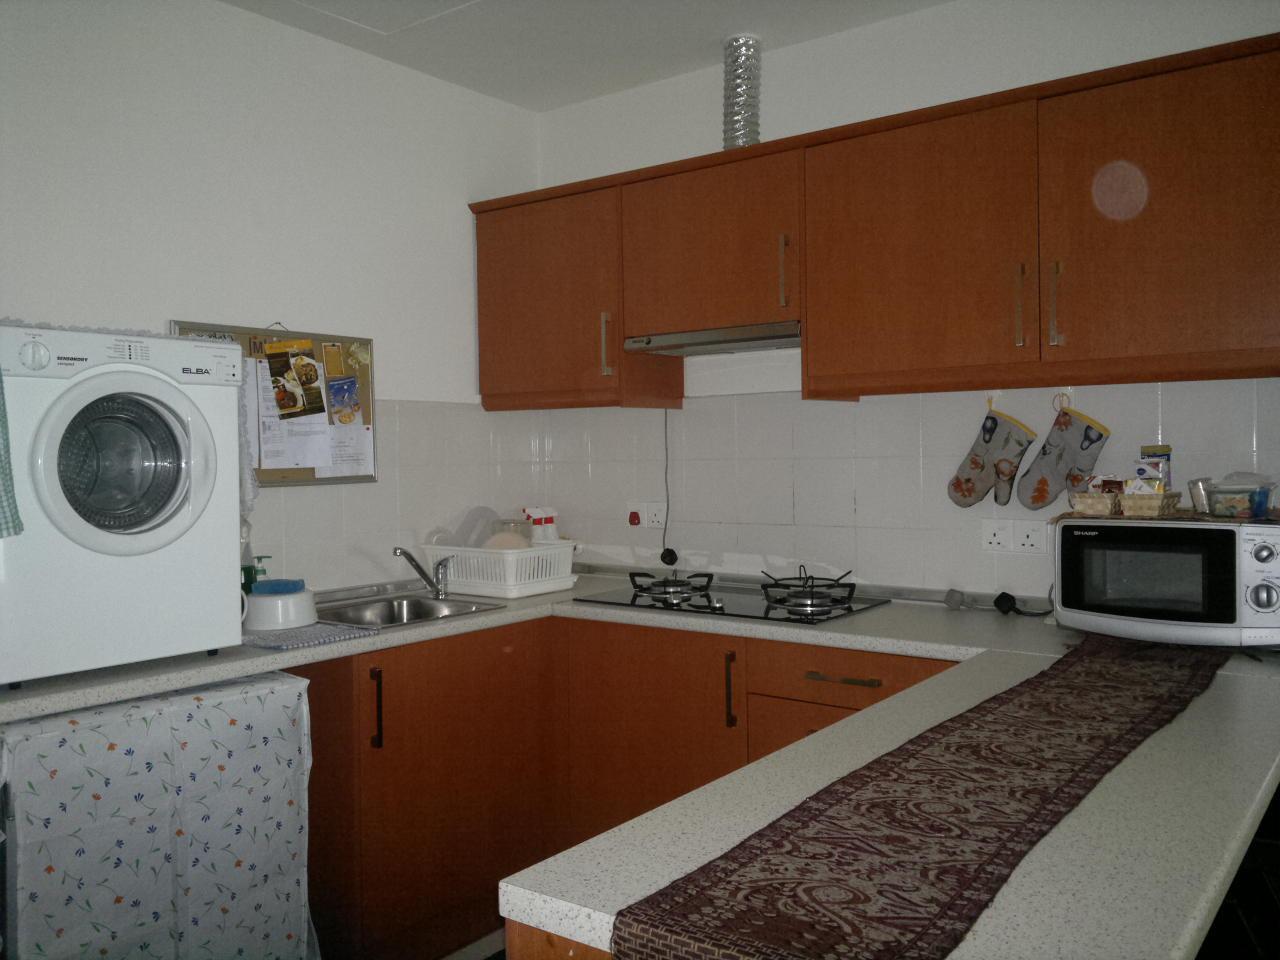 allahu akbar washing machine